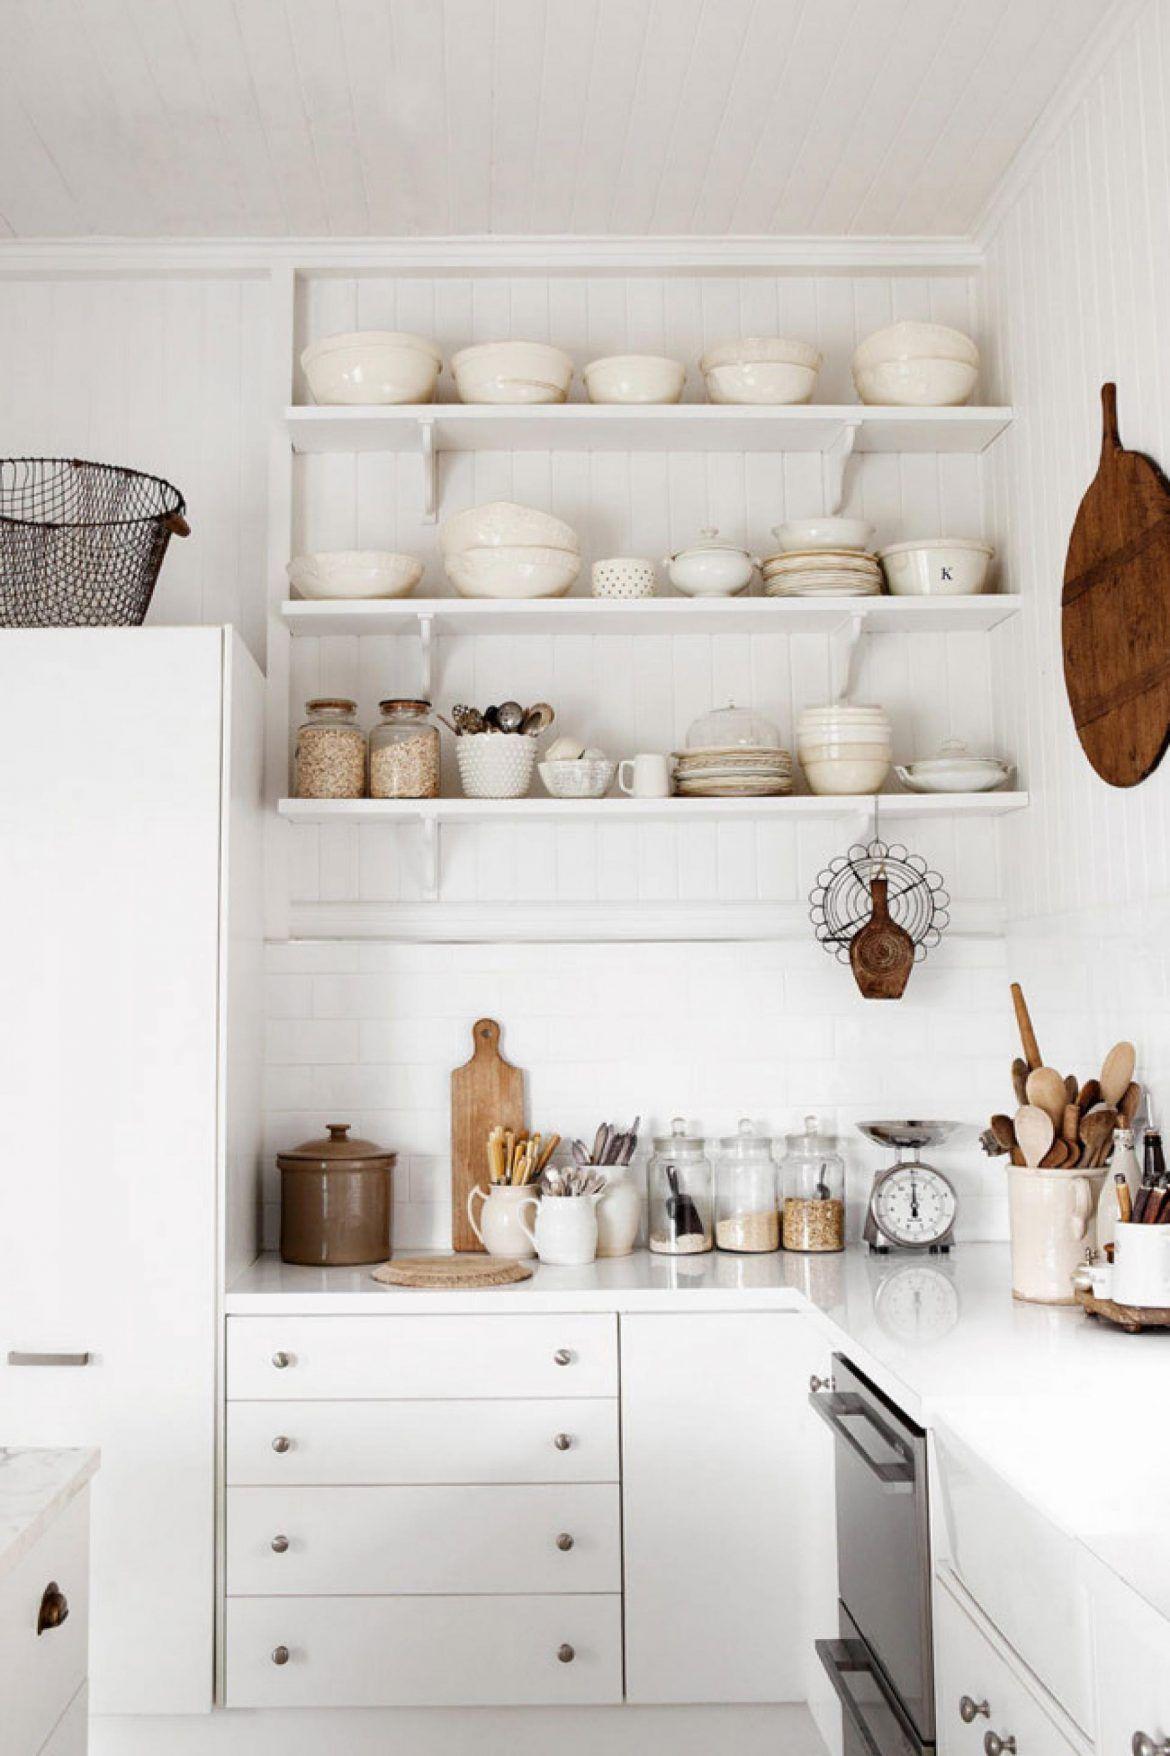 Le Style De Kara Rosenlund Cuisines Design Cuisines Maison Interieur De Cuisine